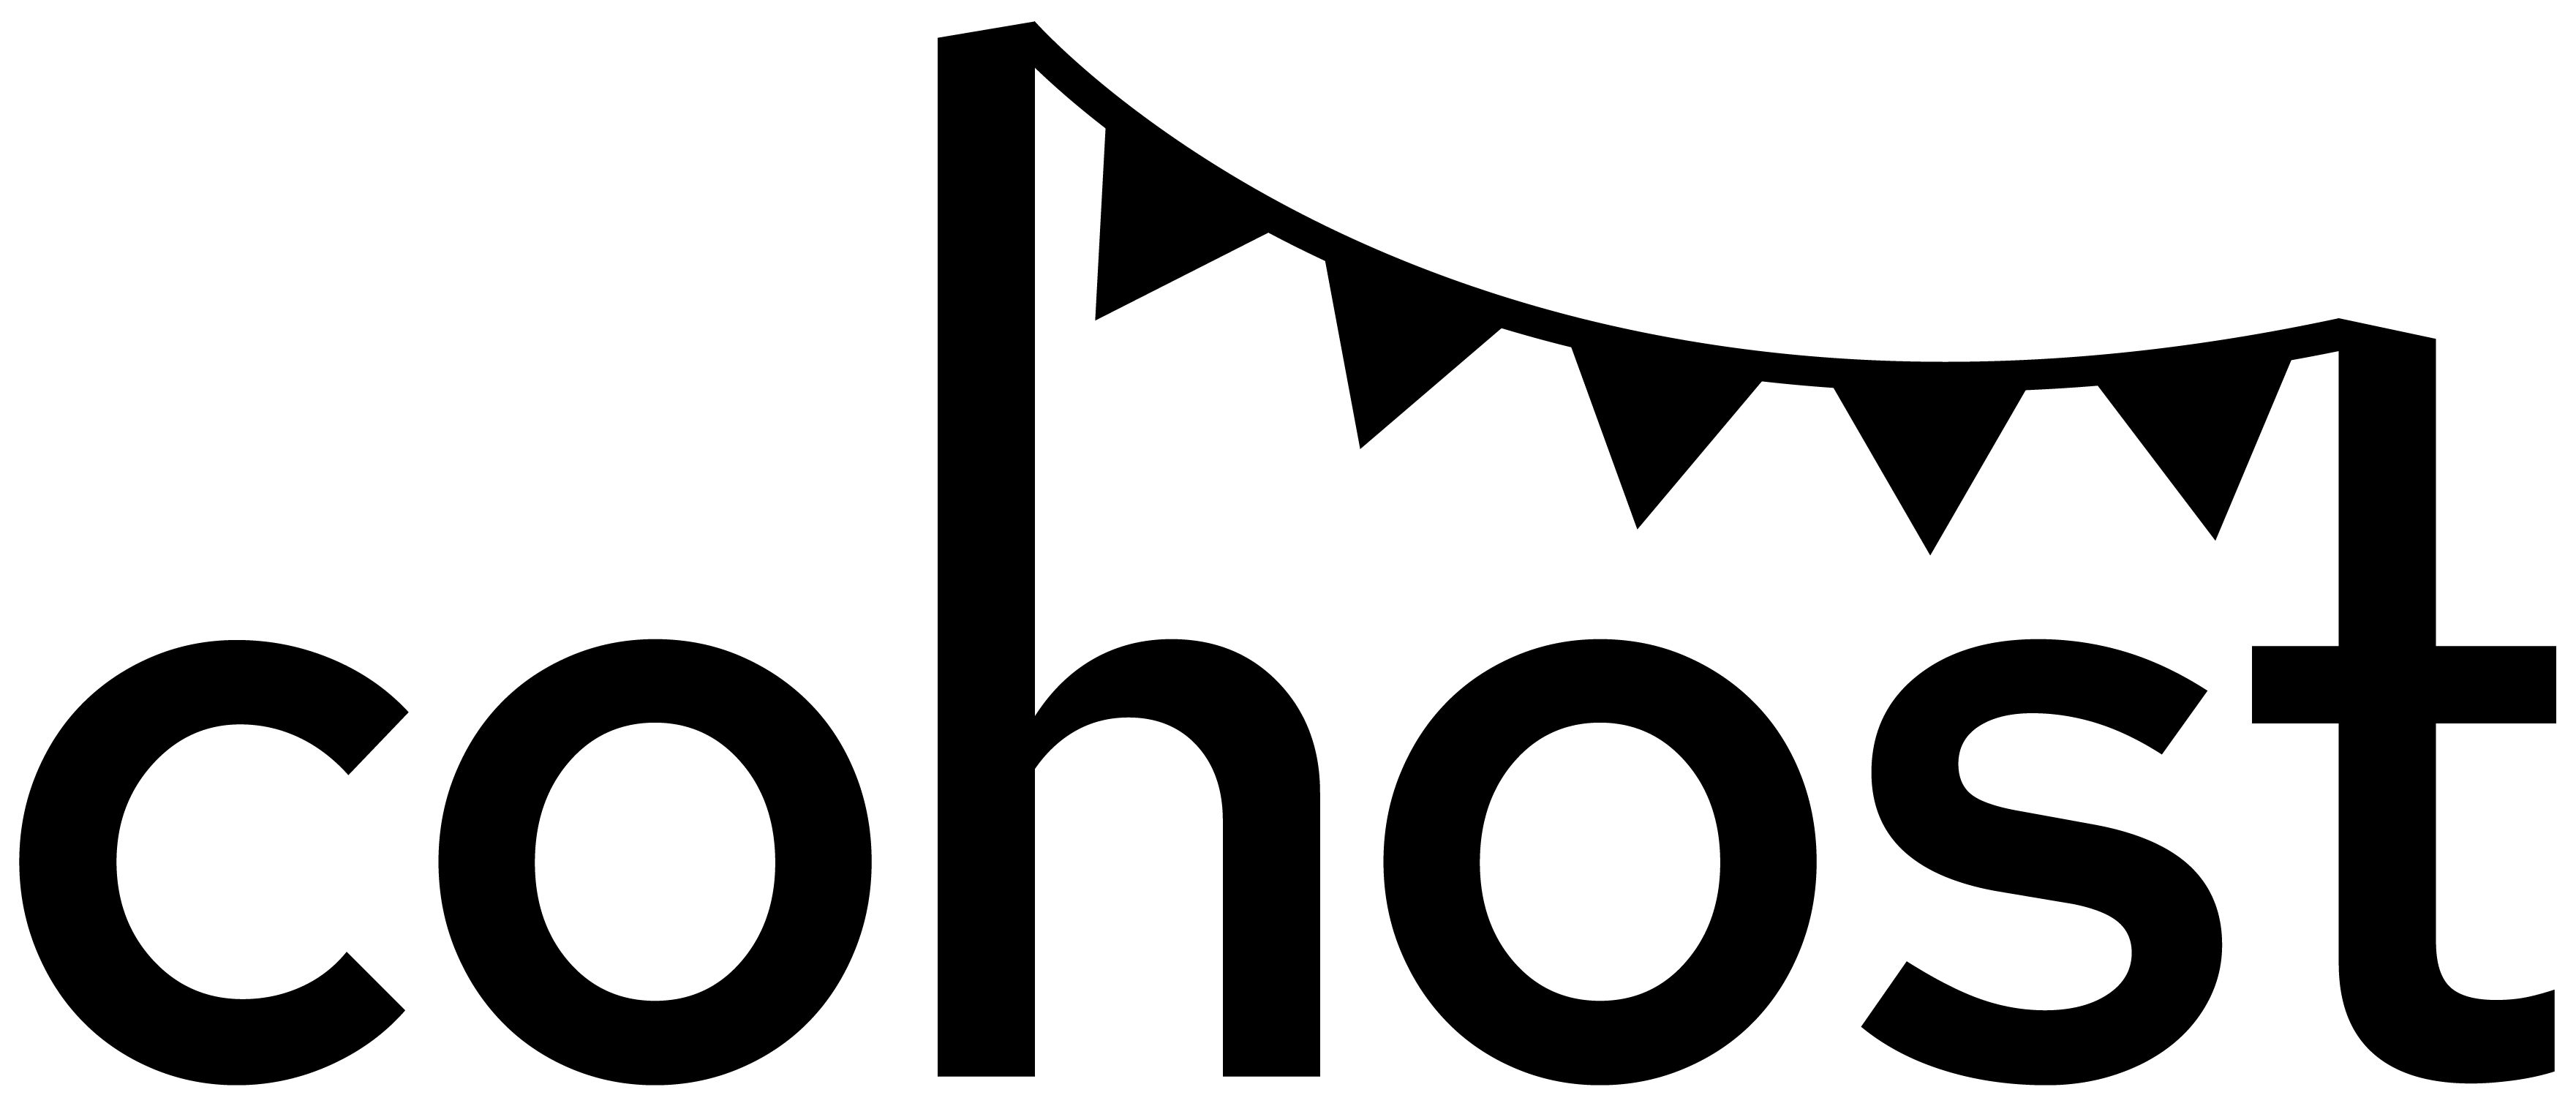 cohost-logo-black